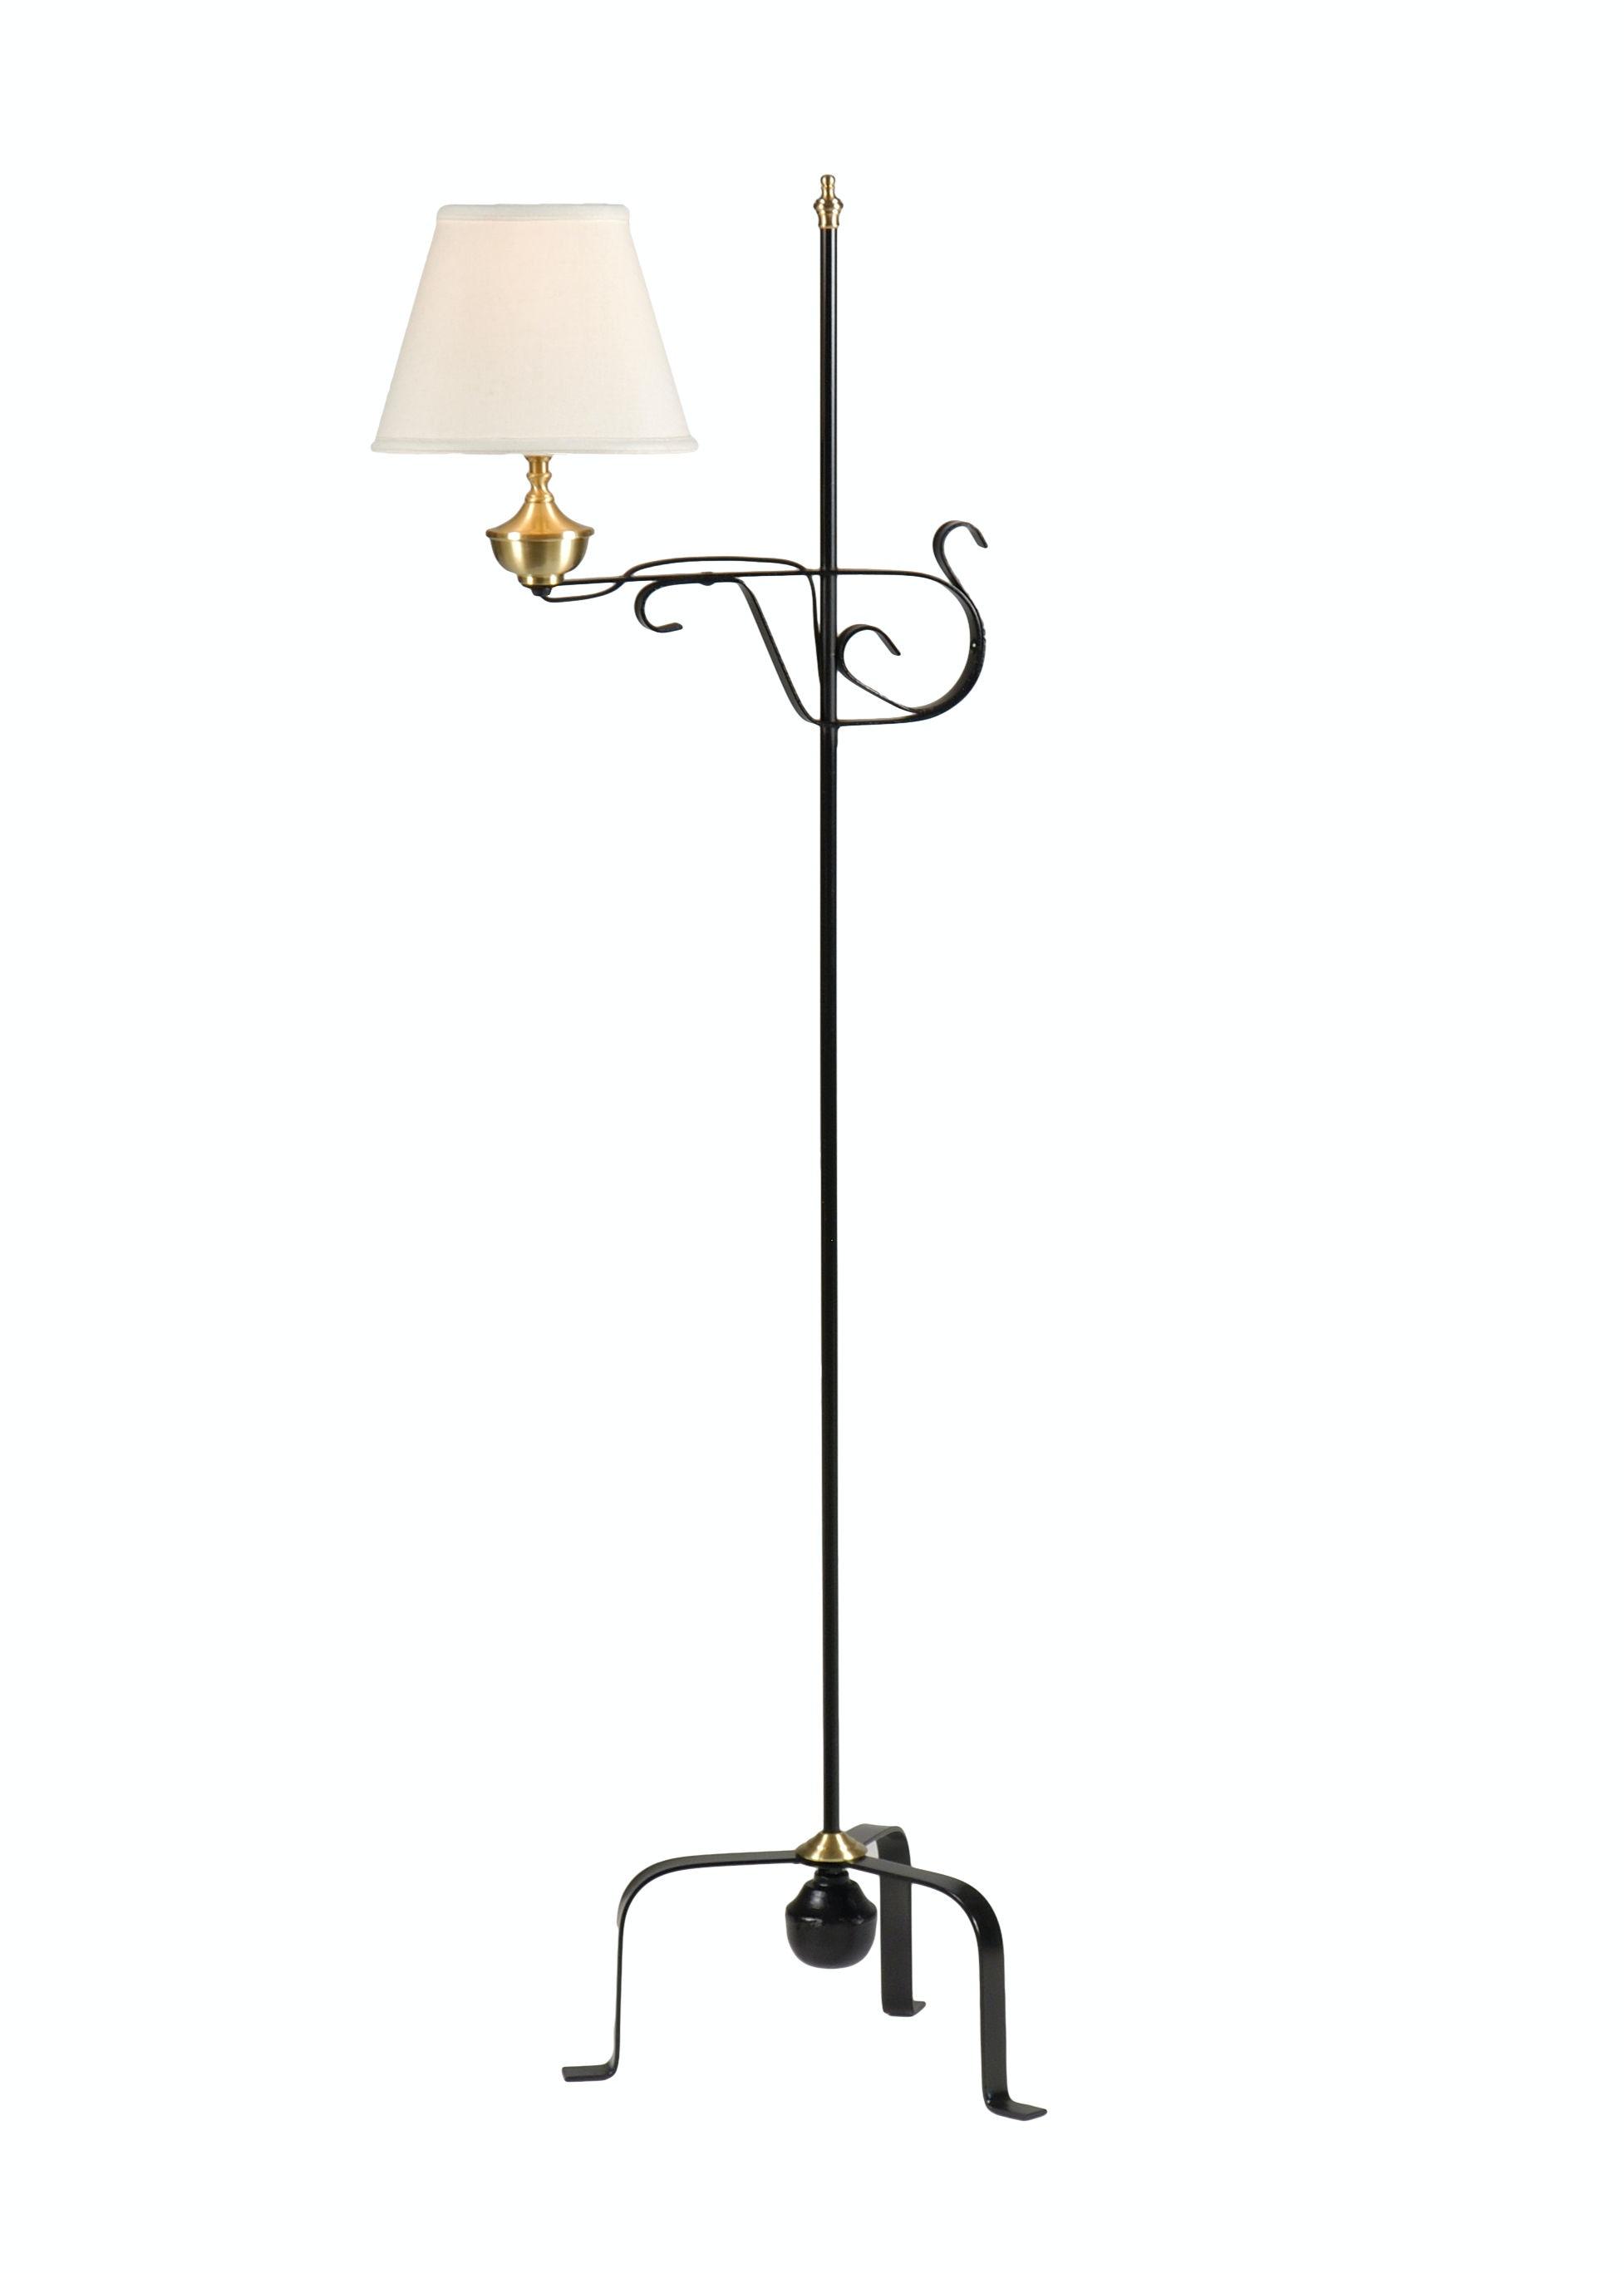 Finest Wildwood Lamps Furniture - Giorgi Brothers - South San Francisco, CA UV83